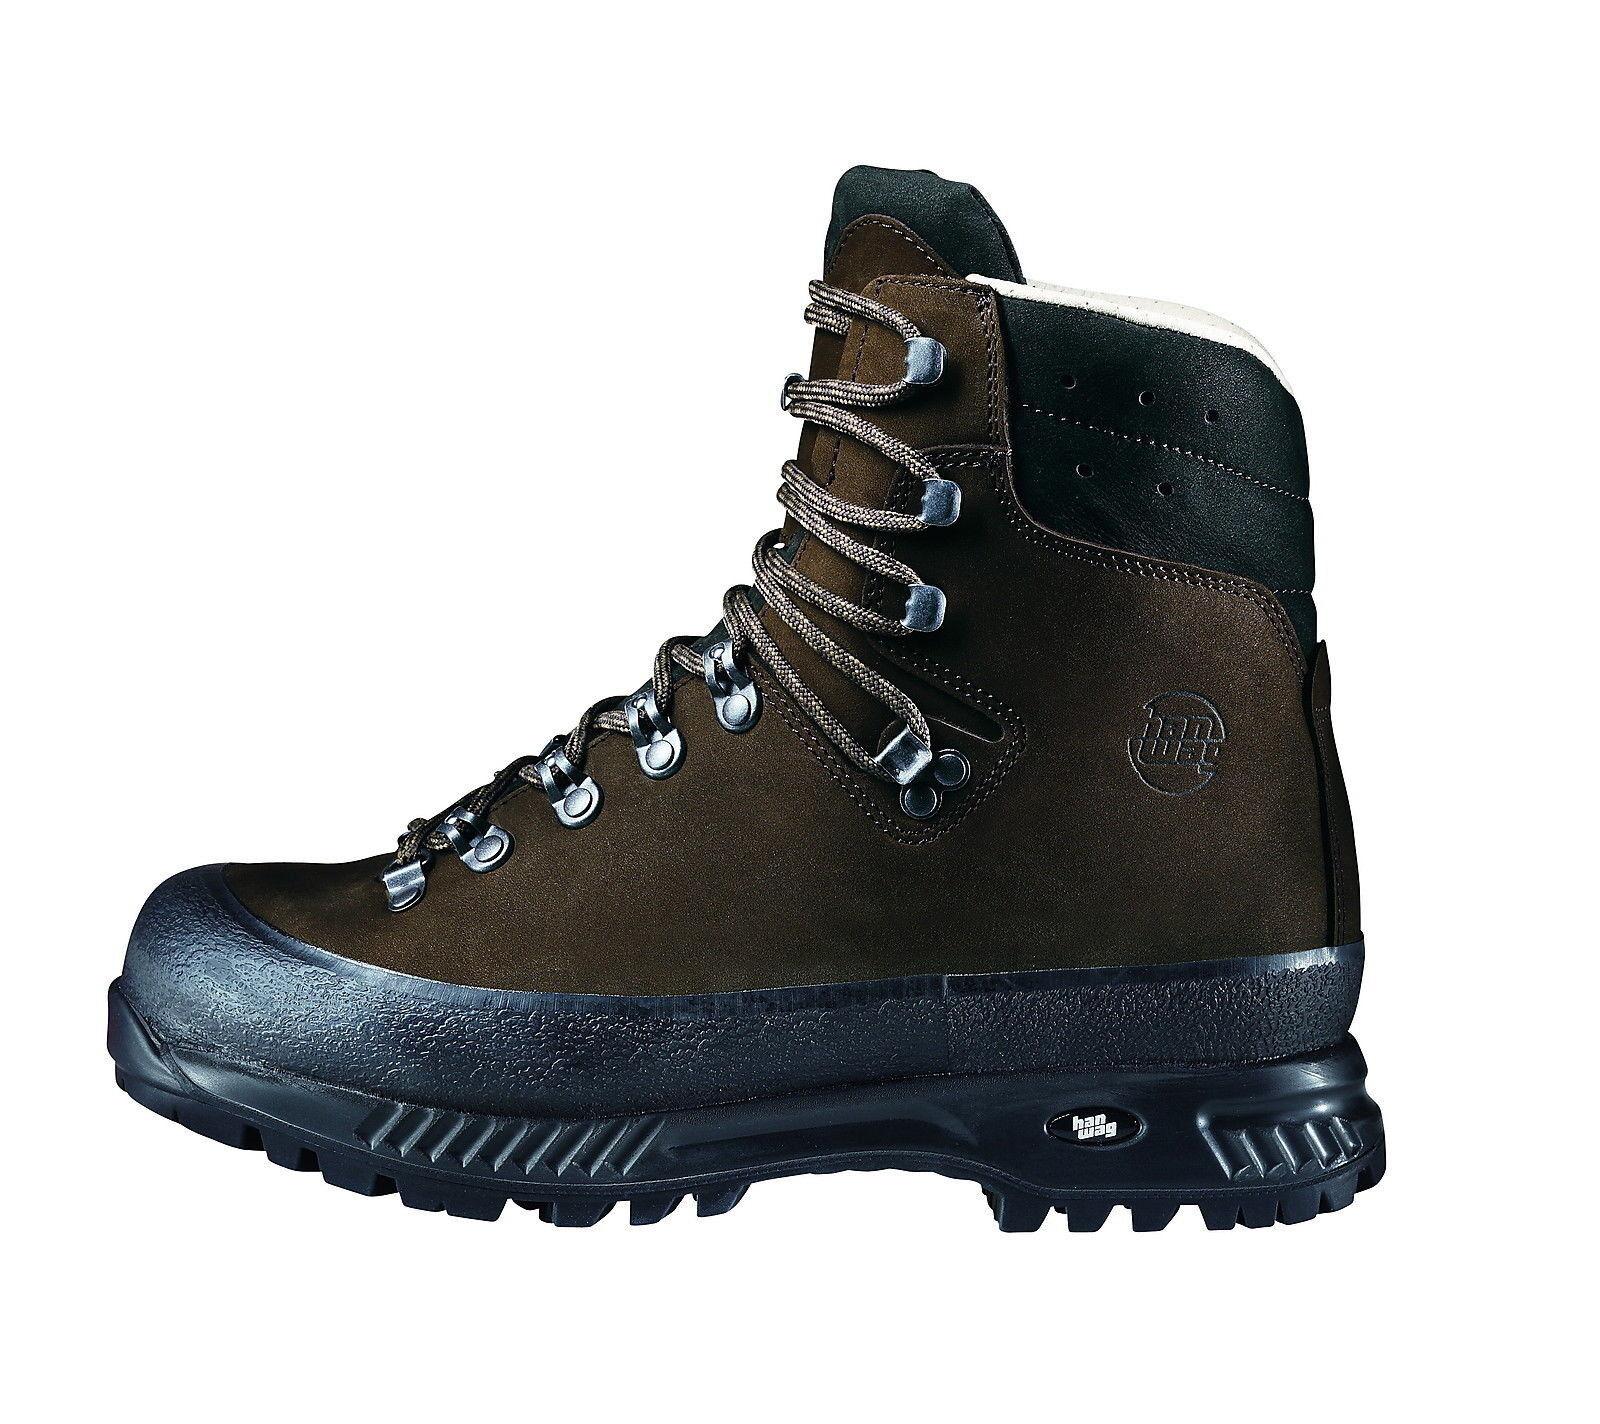 Hanwag Mountain shoes  Yukon Men Leather Size 8,5 - 42,5 Earth